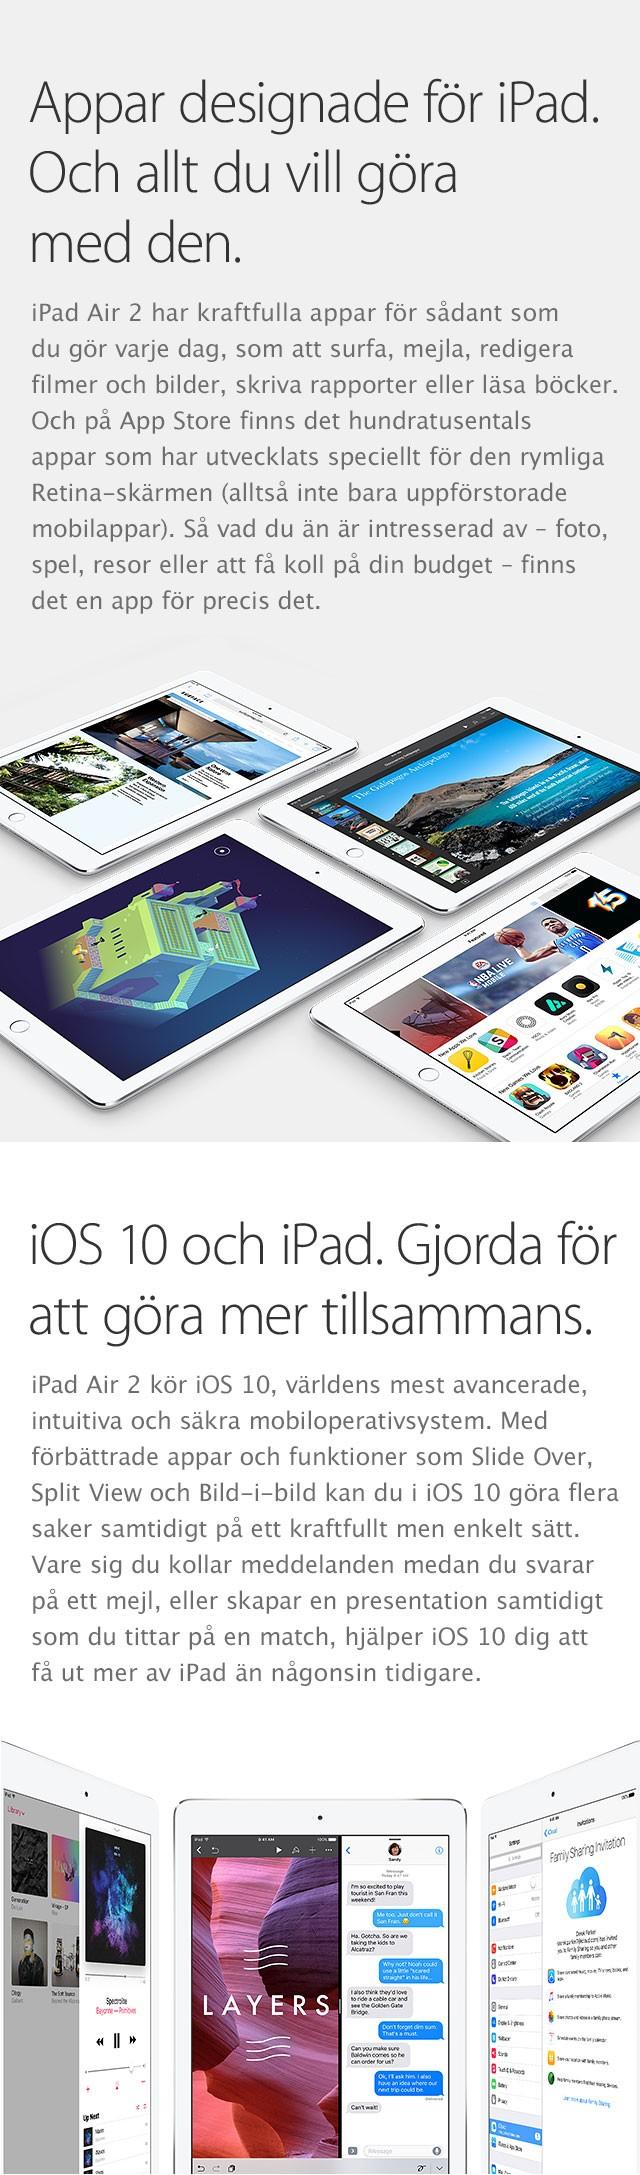 iCloud och iOS fungerar perfekt på iPad Air 2